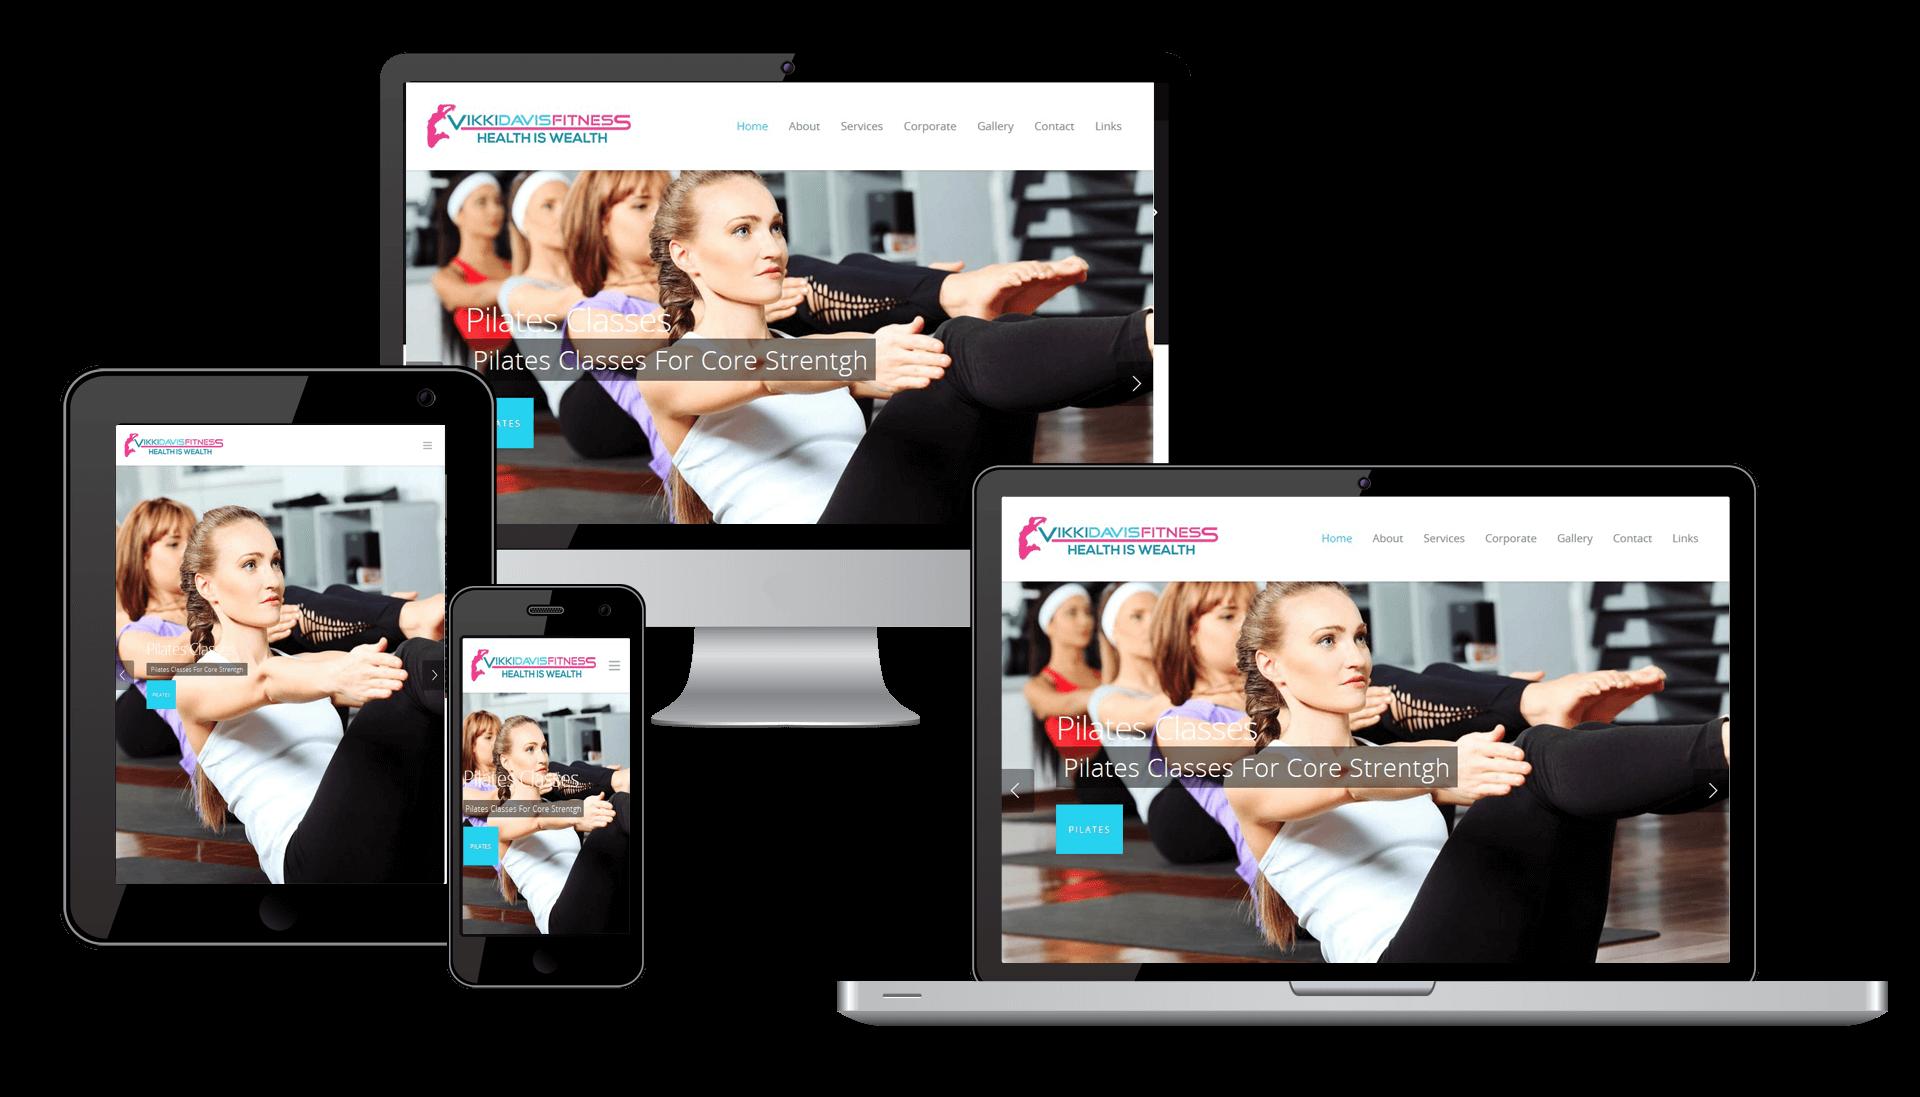 Vikki Davis Fitness Website Complete Responsive